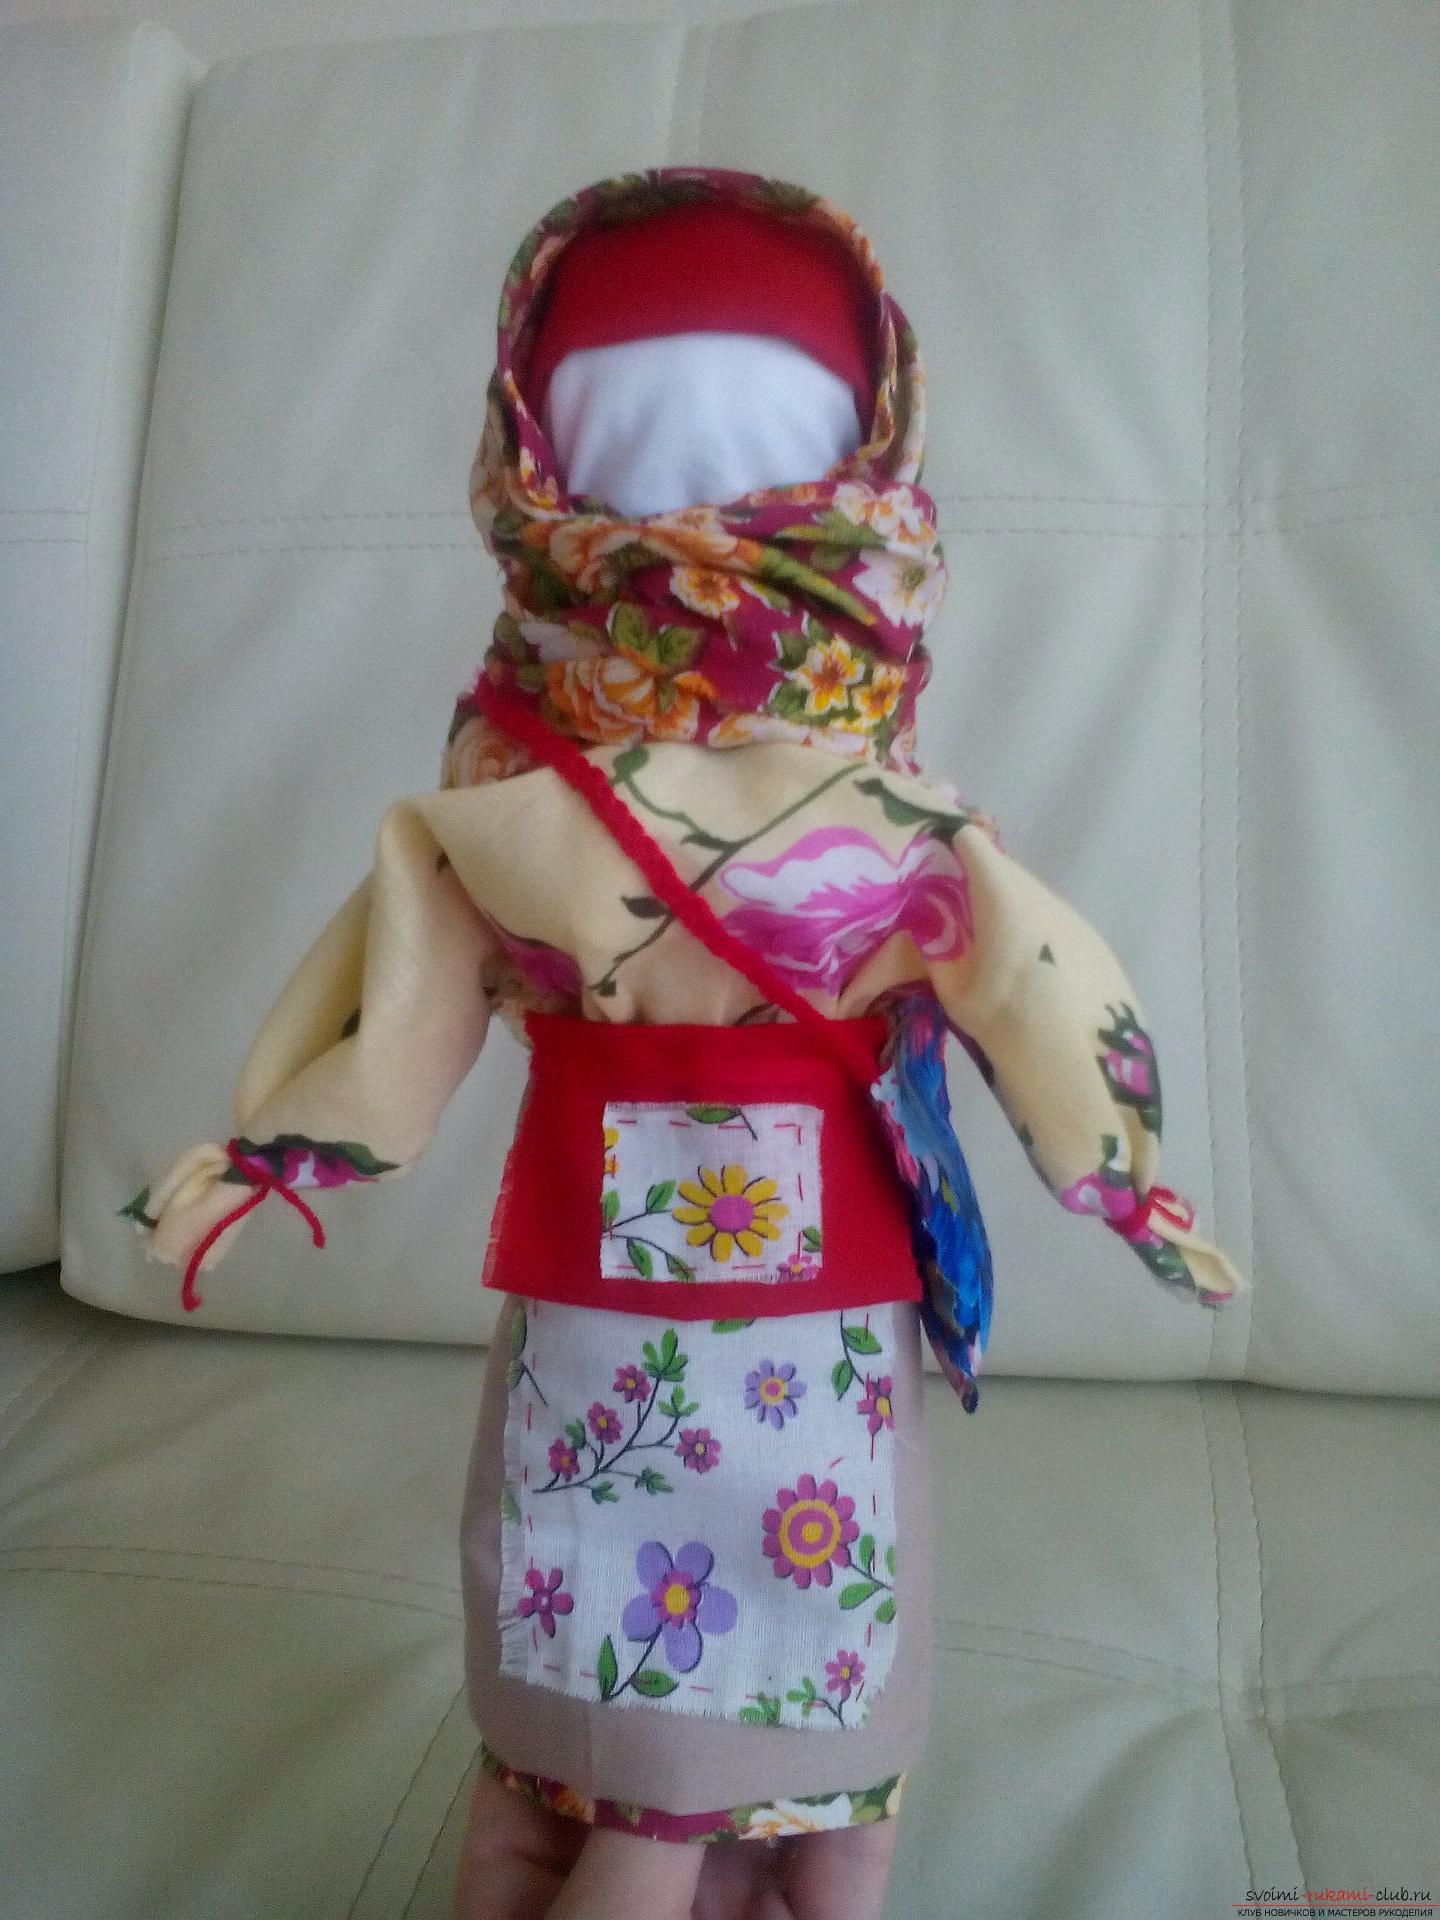 Куклы-обереги своими руками — мастер-класс. Славянские куклы-обереги своими руками. Тряпичные куклы-обереги